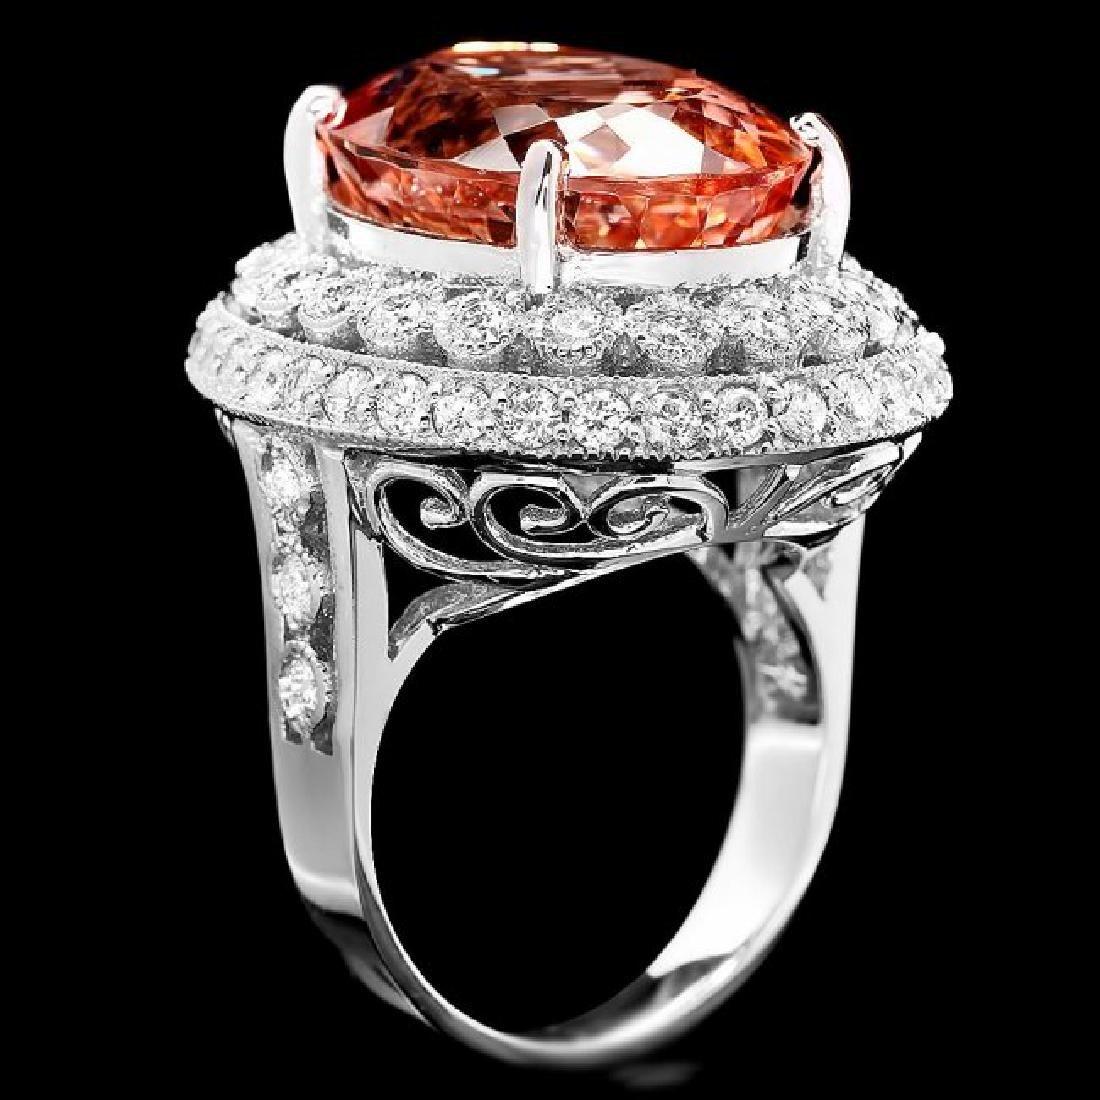 14k Gold 16.20ct Morganite 1.85ct Diamond Ring - 2